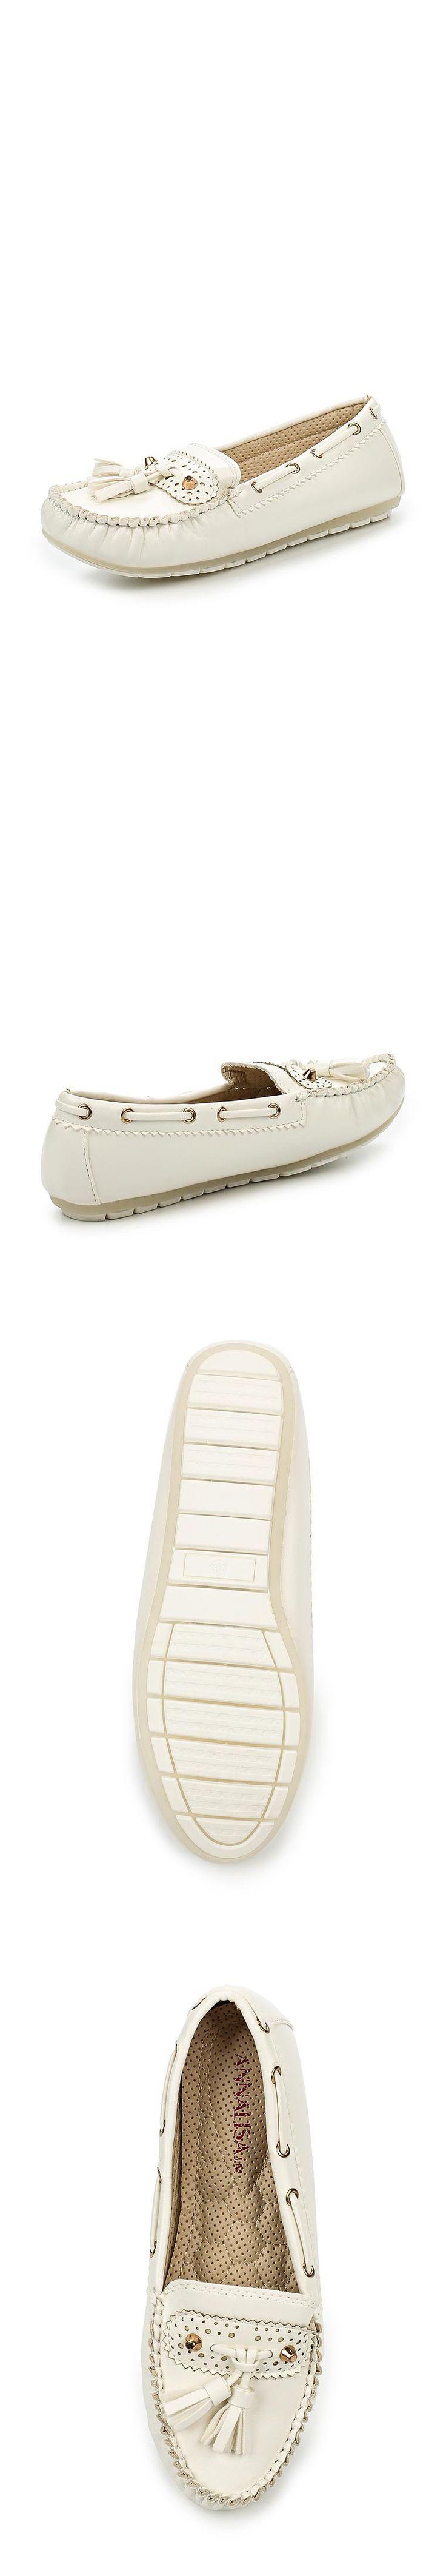 Женская обувь мокасины Annalisa за 1750.00 руб.